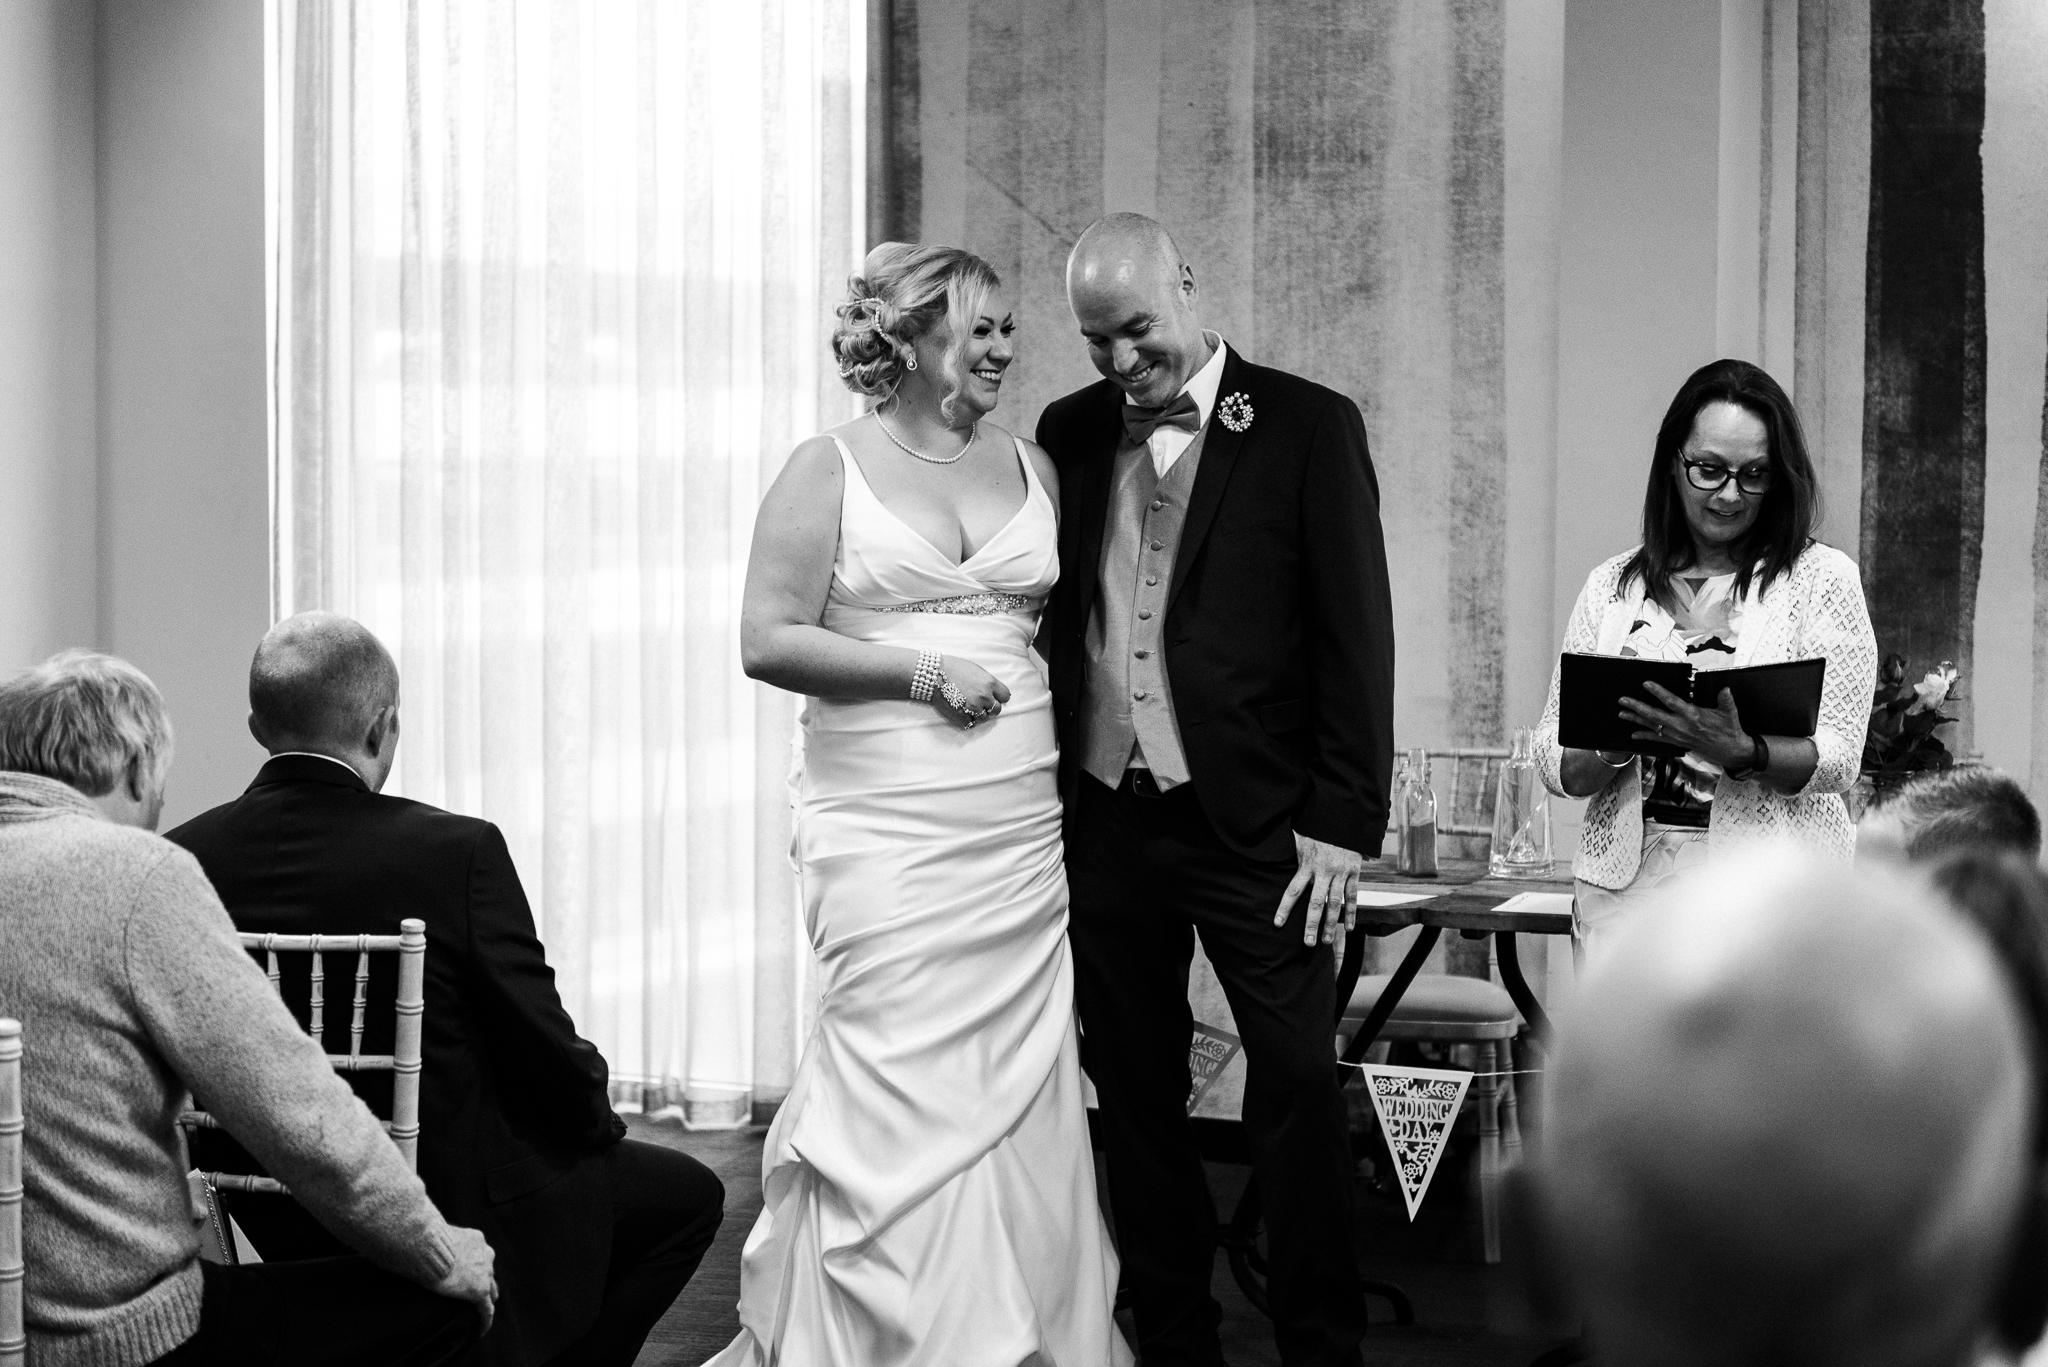 Manchester Wedding Photography On the 7th Media City UK, Salford 20s Art Deco Feathers Urban - Jenny Harper-19.jpg